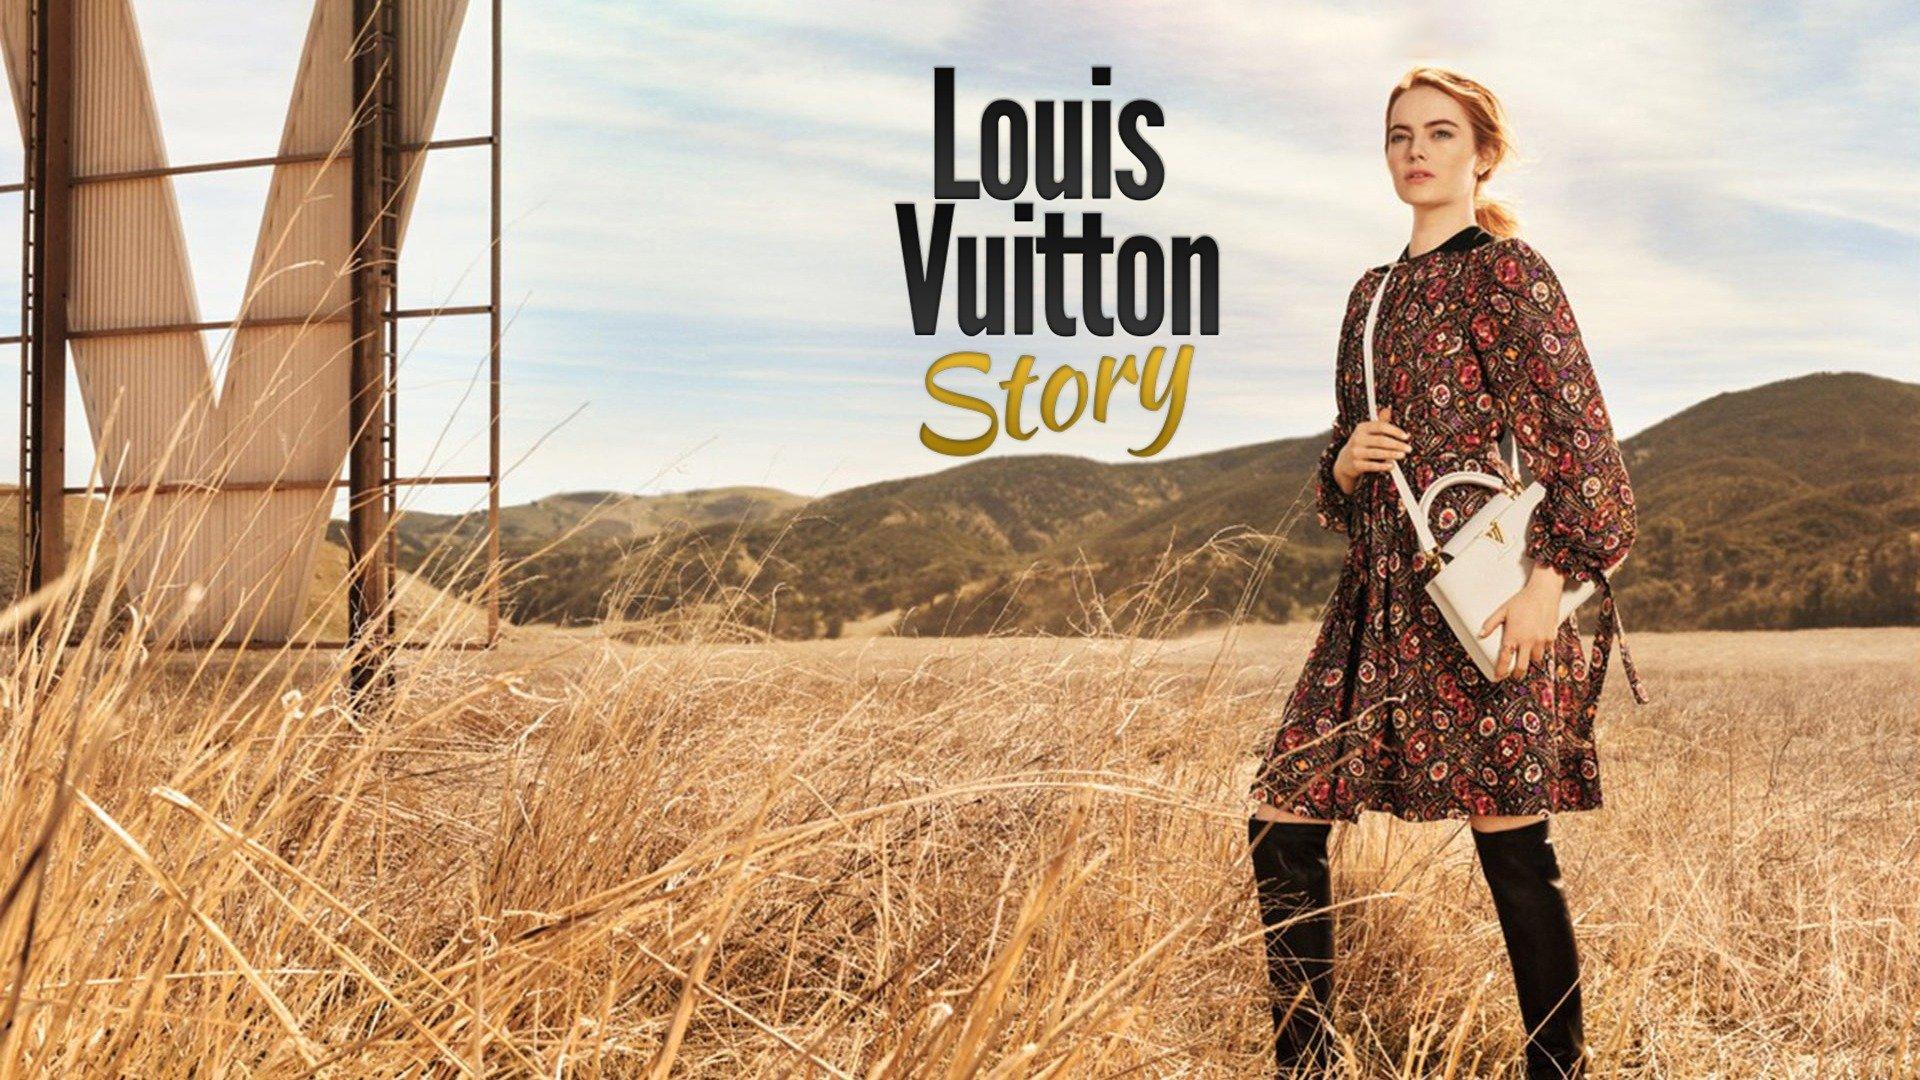 Louis Vuitton Story